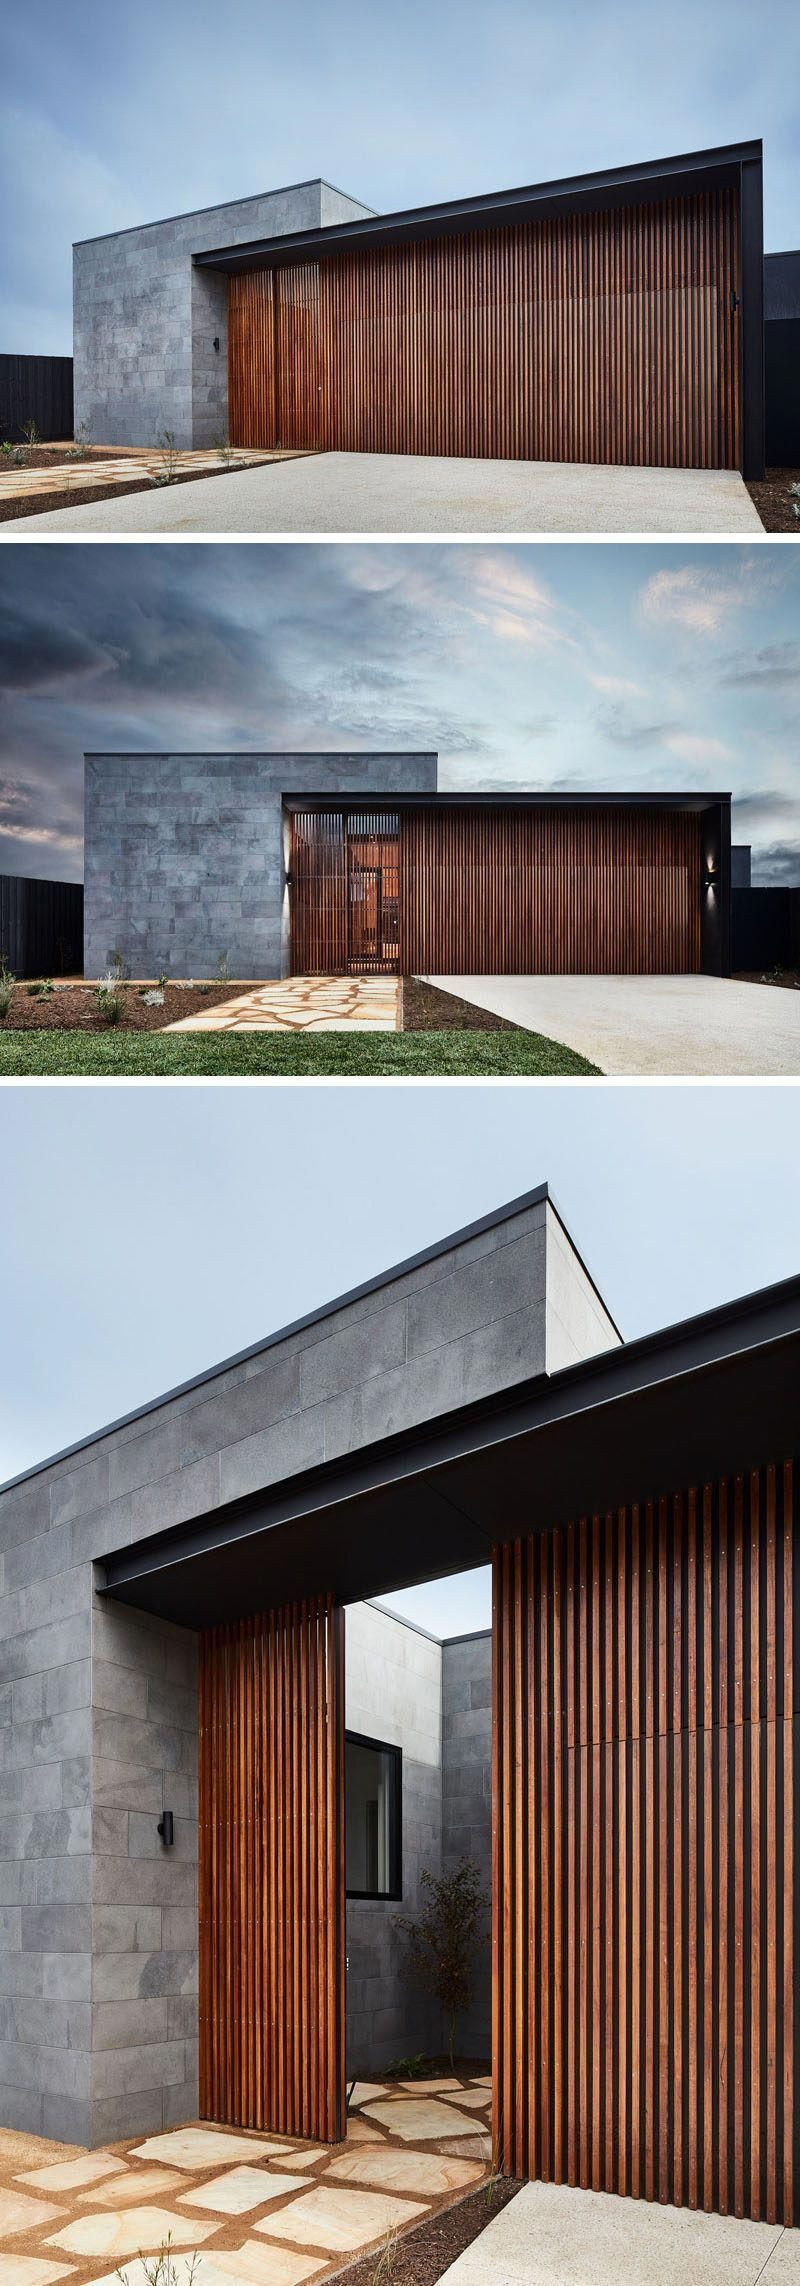 Modern House Exterior Design Front Door Ideas Wood Facade Wooden Garage Door: Auhaus Architecture / Barwon Heads Australia #moderninteriordoors